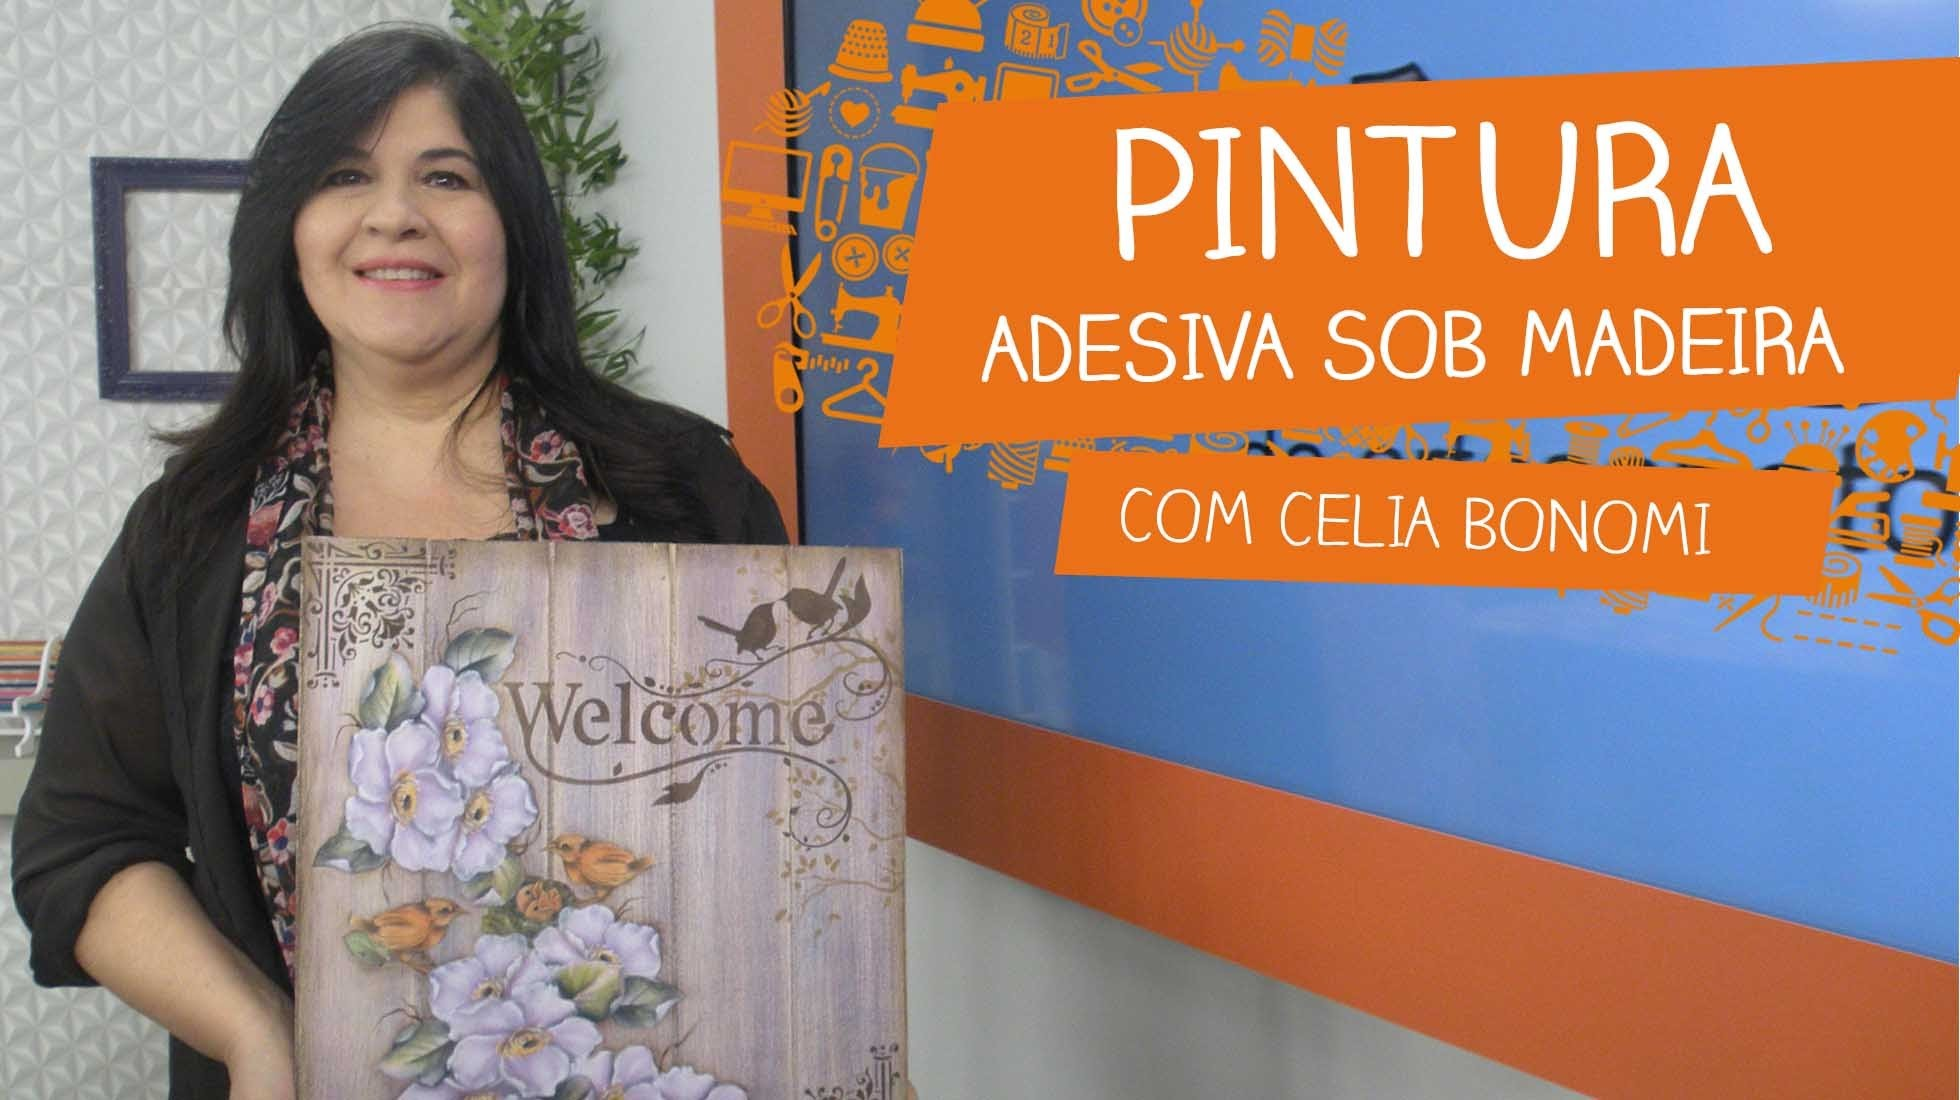 Pintura Adesiva sob Madeira com Celia Bonomi | Vitrine do Artesanato na TV